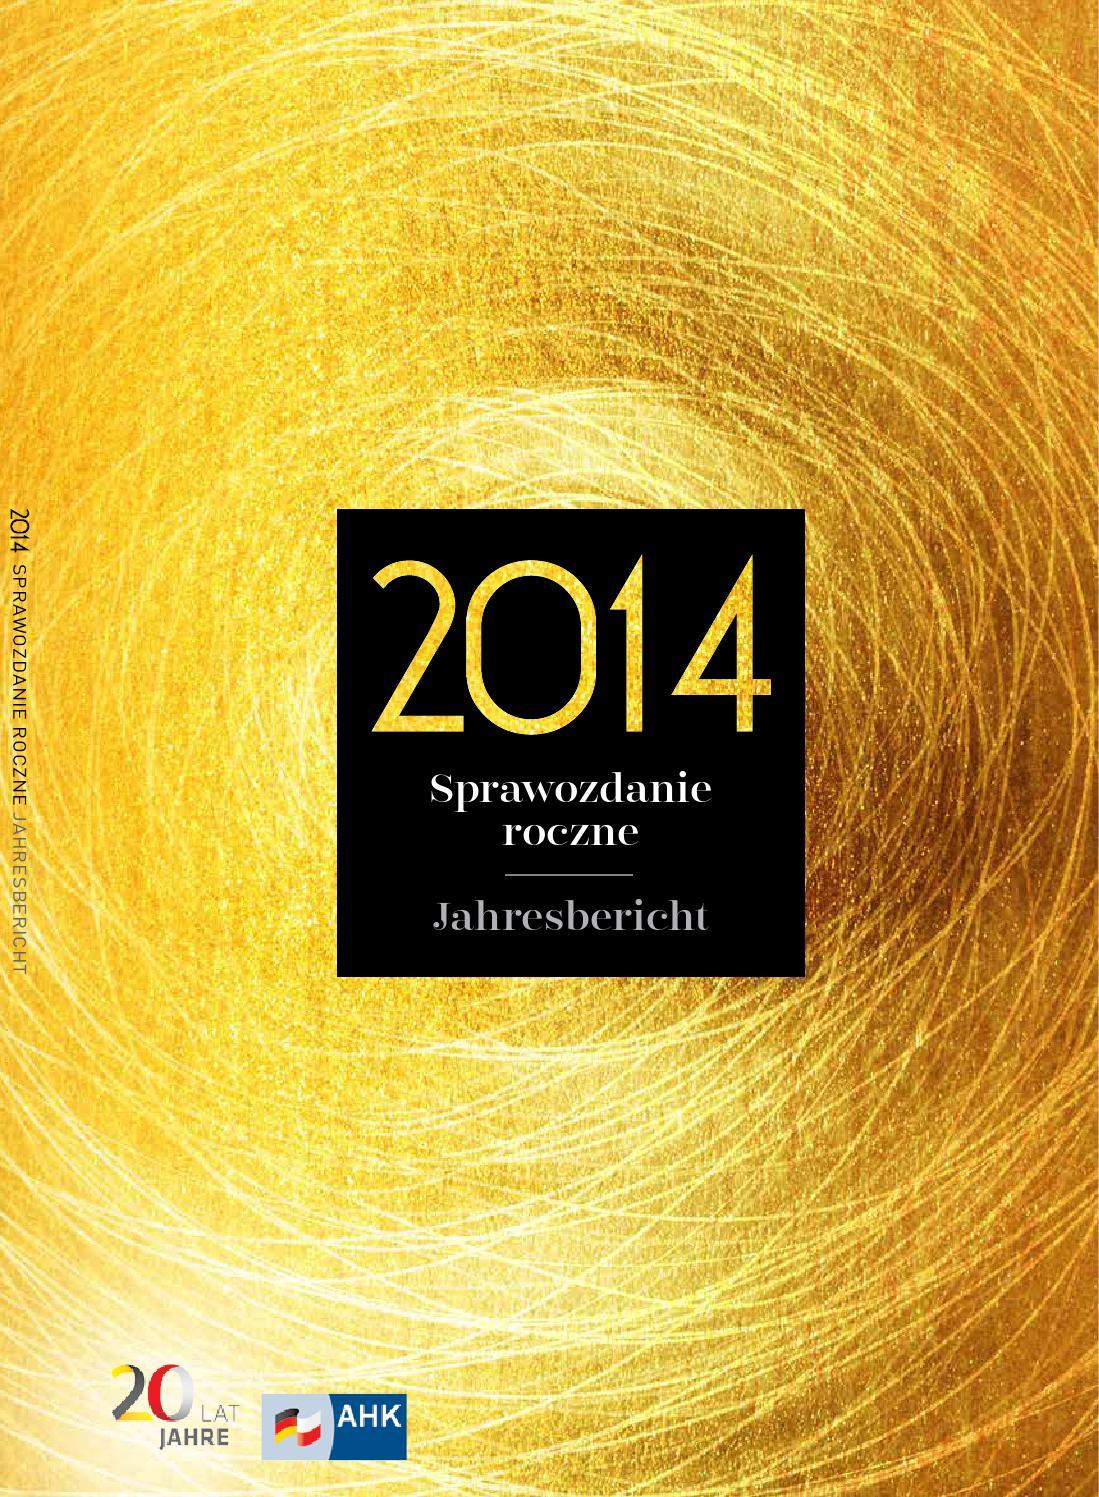 Ahk Raport 2014 By Pola Design Issuu